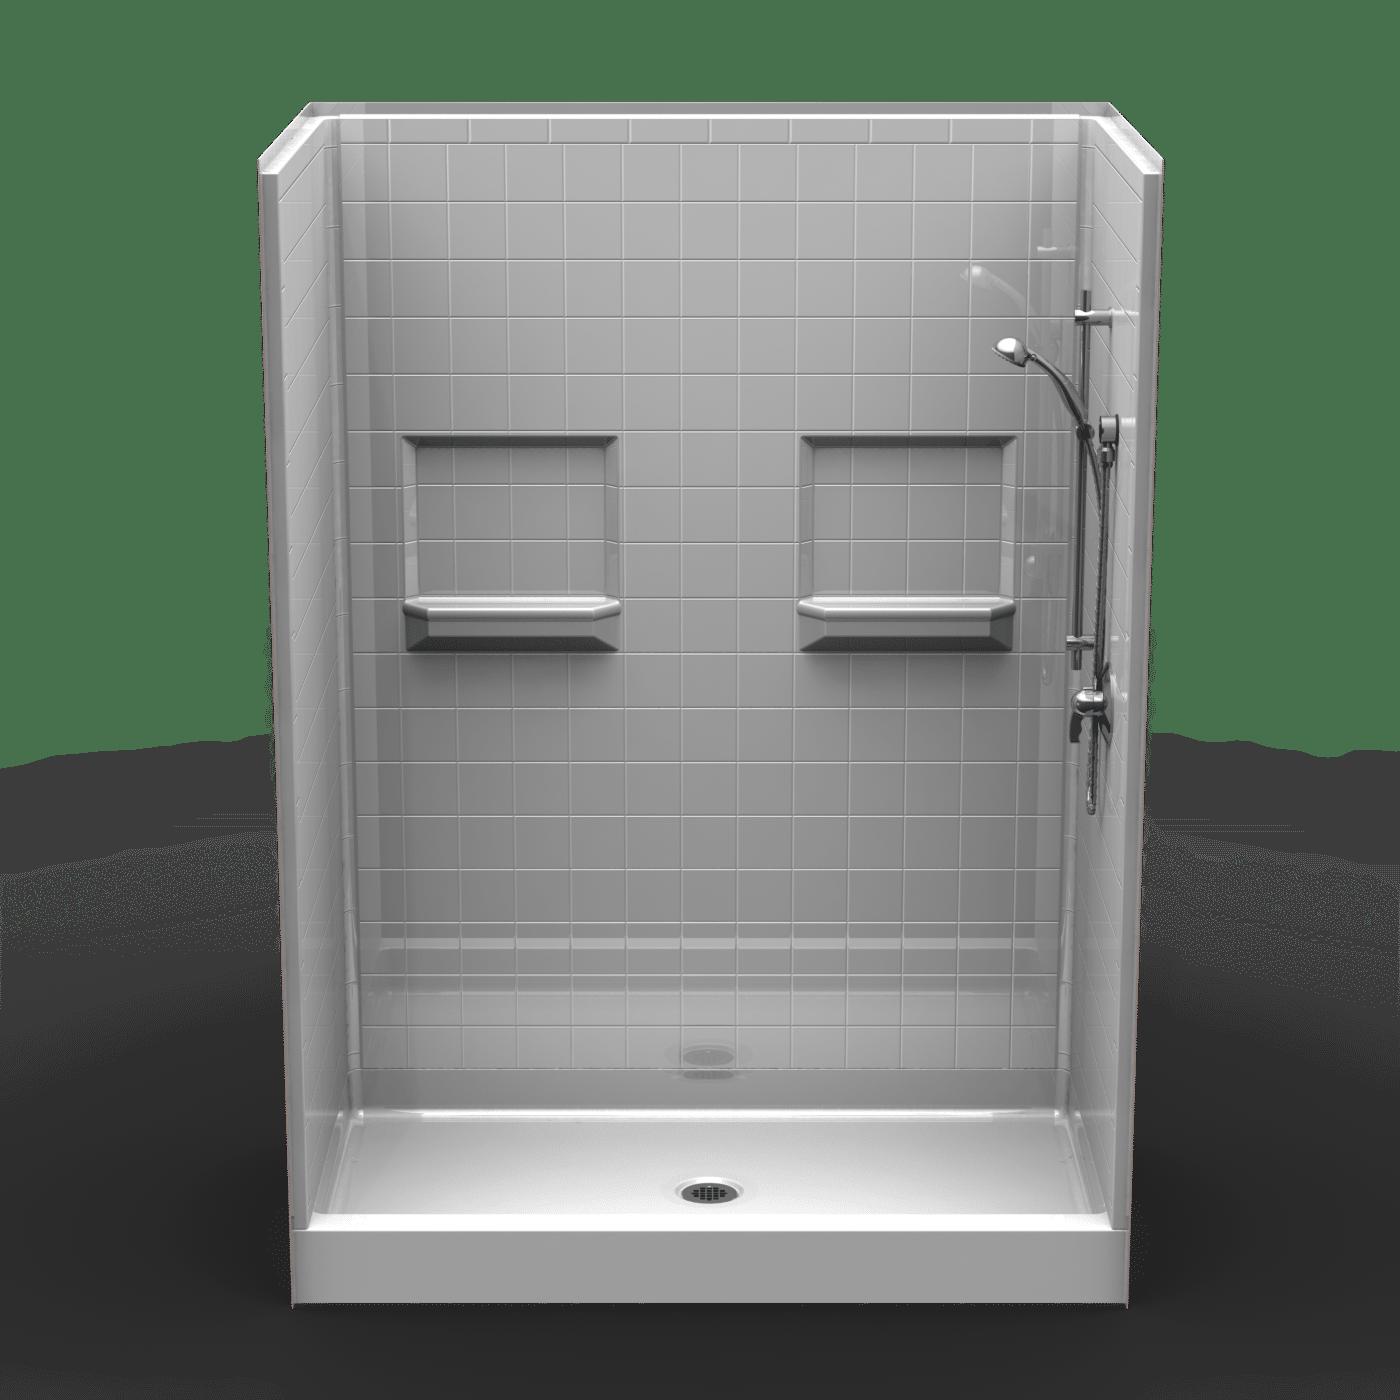 Remodeler Shower Five Piece 60x32 Real Tile Look